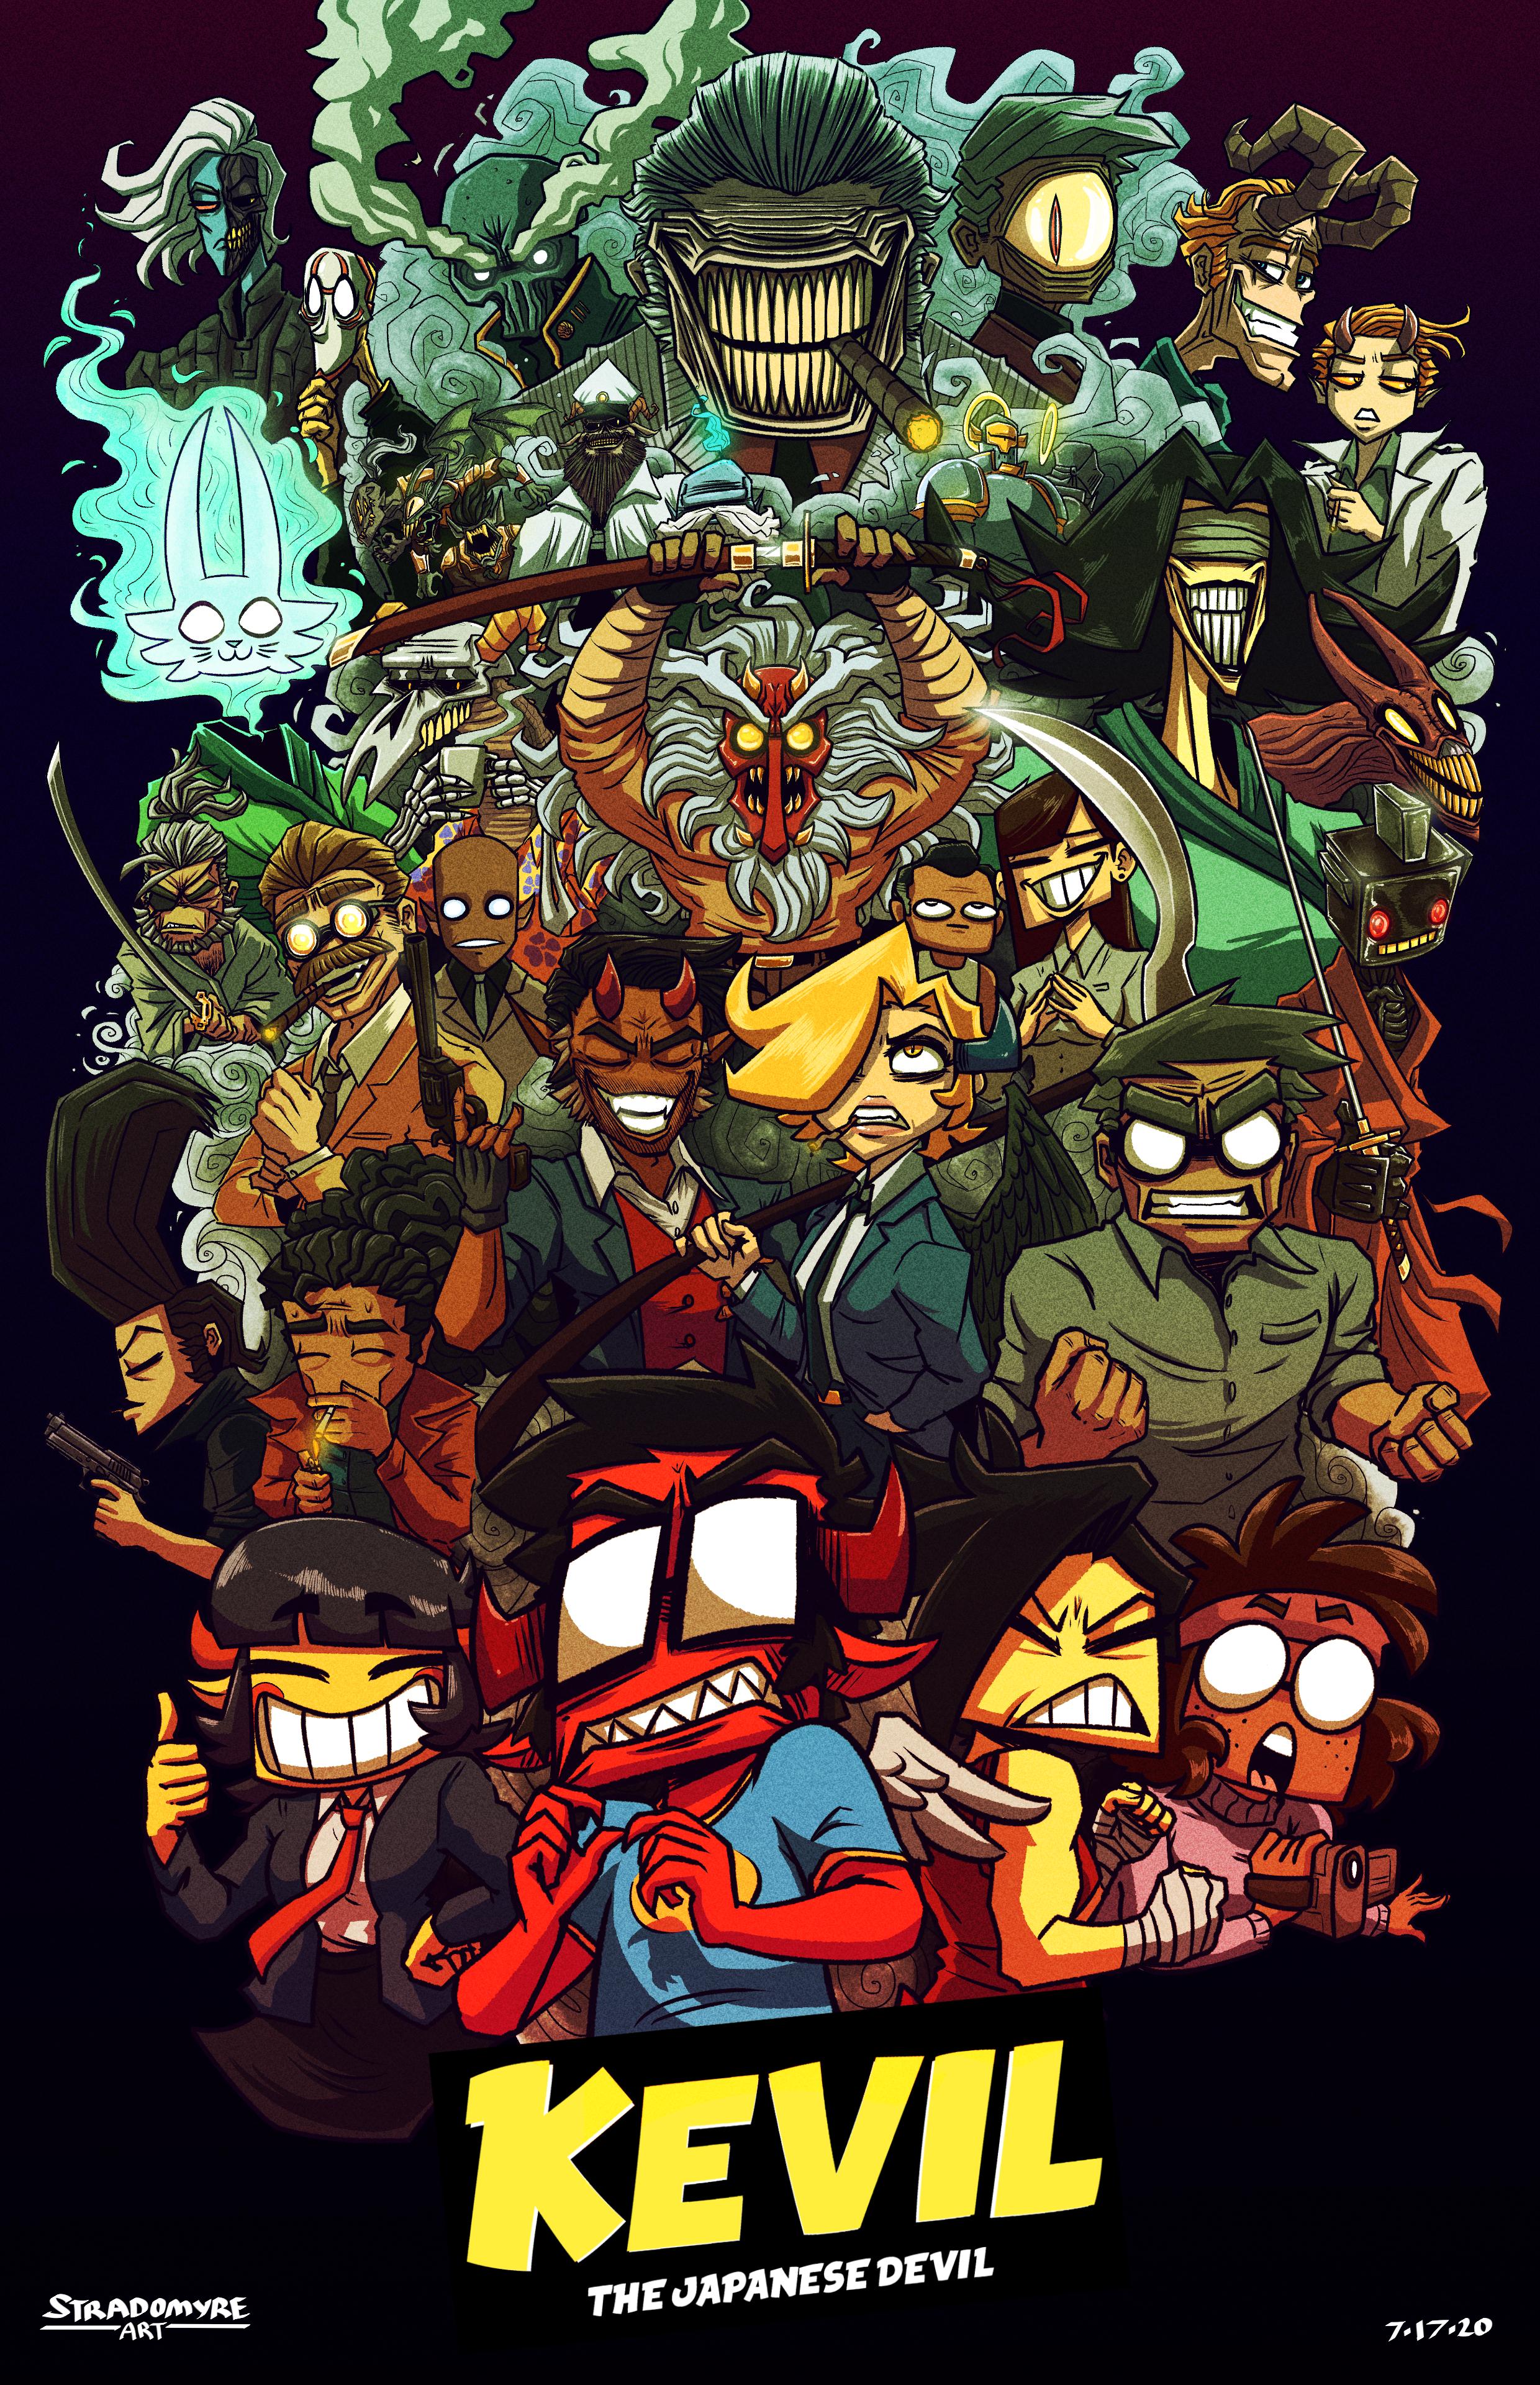 Kevil the Japanese Devil - Cast Poster